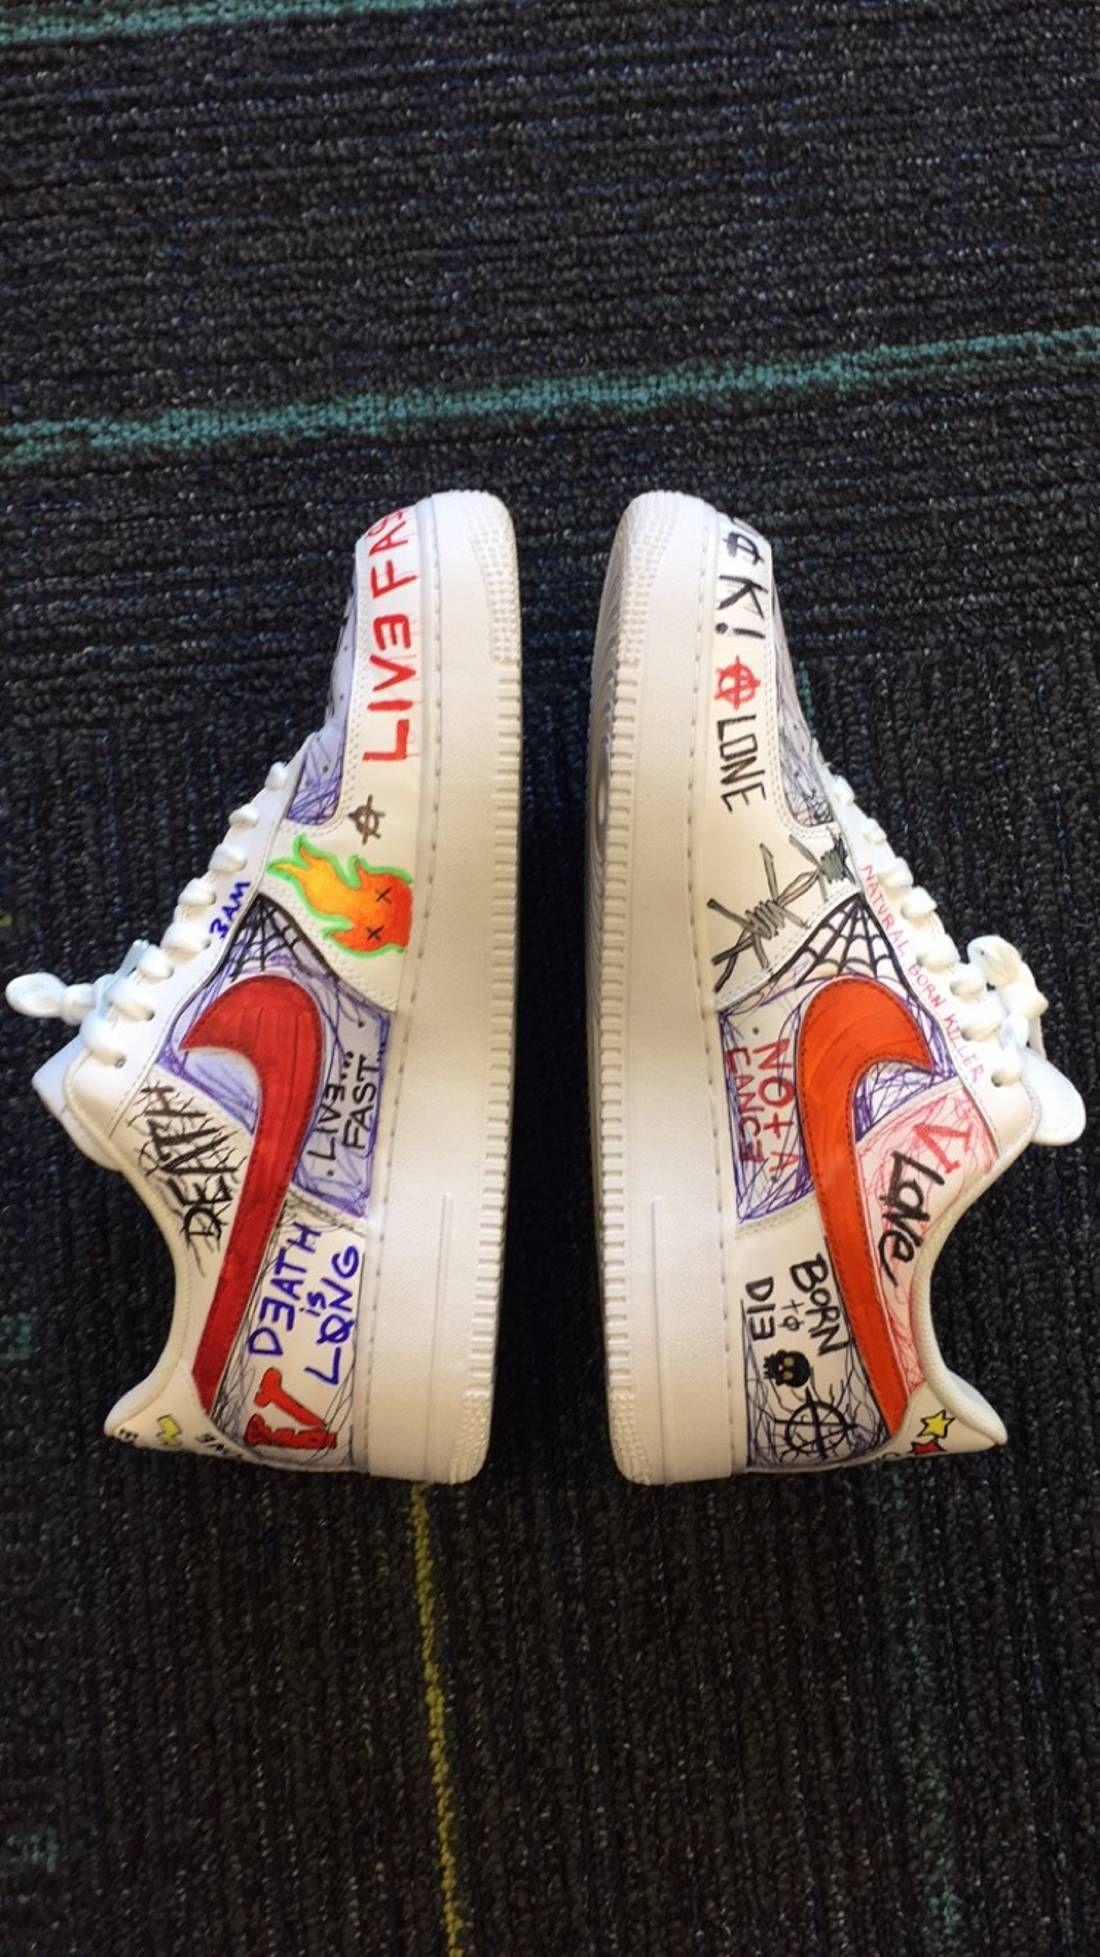 e1e6f06acf866 Nike Custom Nike Air Force Vlone Asap Mob Size US 12.5 / EU 45-46 - 1